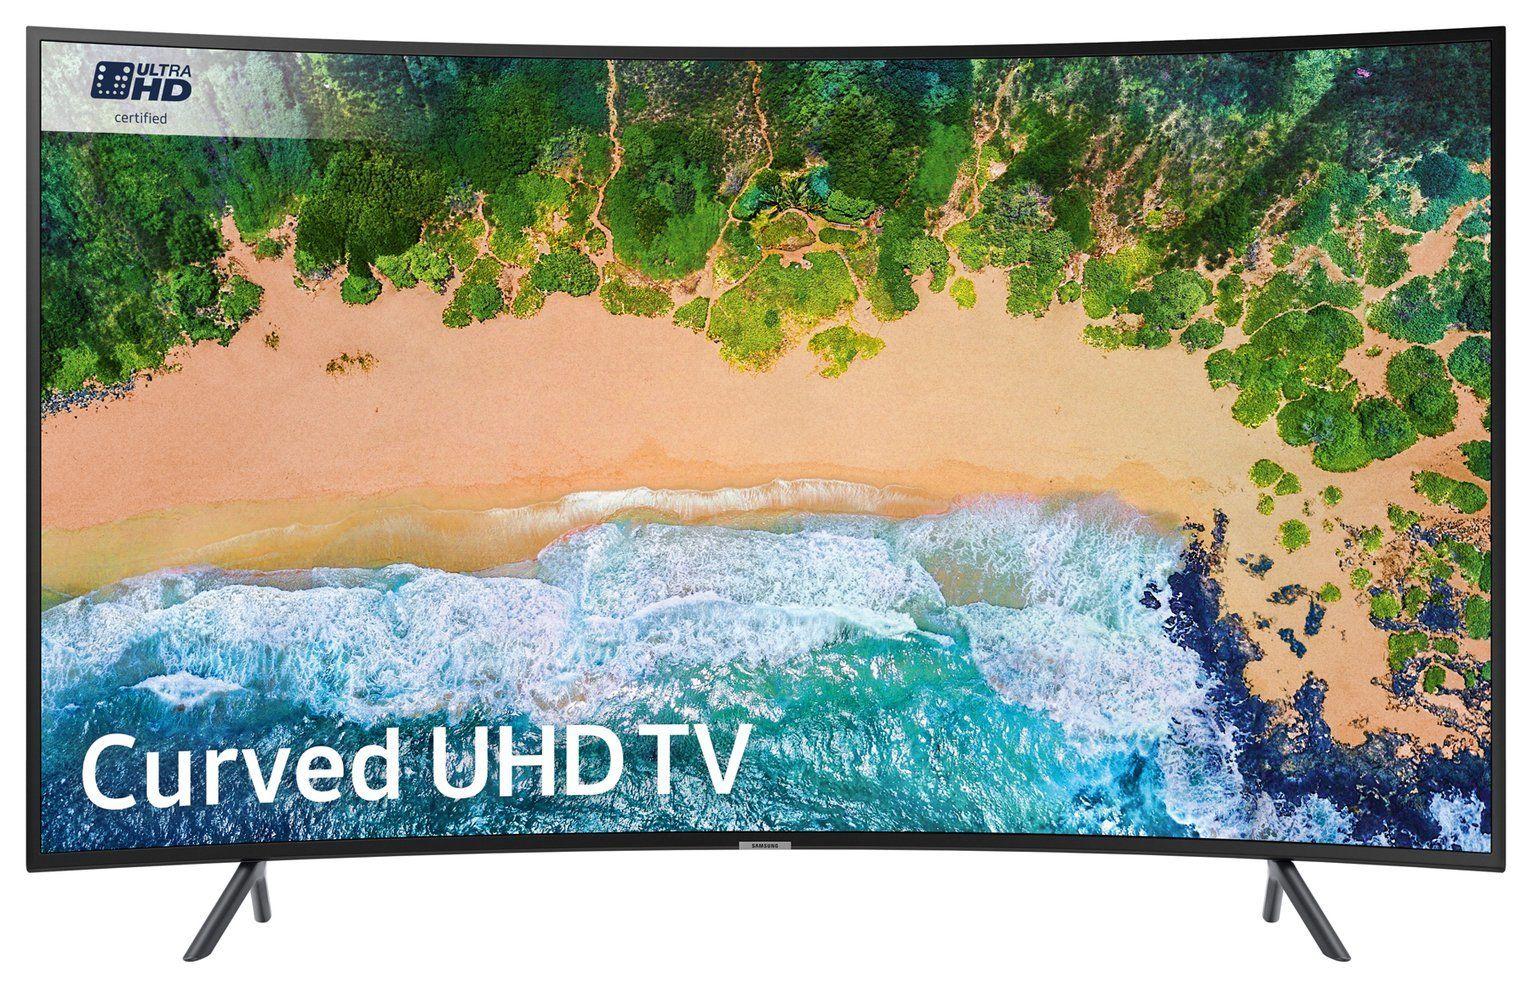 Samsung 55NU7300 55 Inch Curved 4K Ultra HD HDR Smart WiFi LED TV - Black - £254.99 delivered @ Argos eBay (Refurb w/ 1 Year Guarantee)